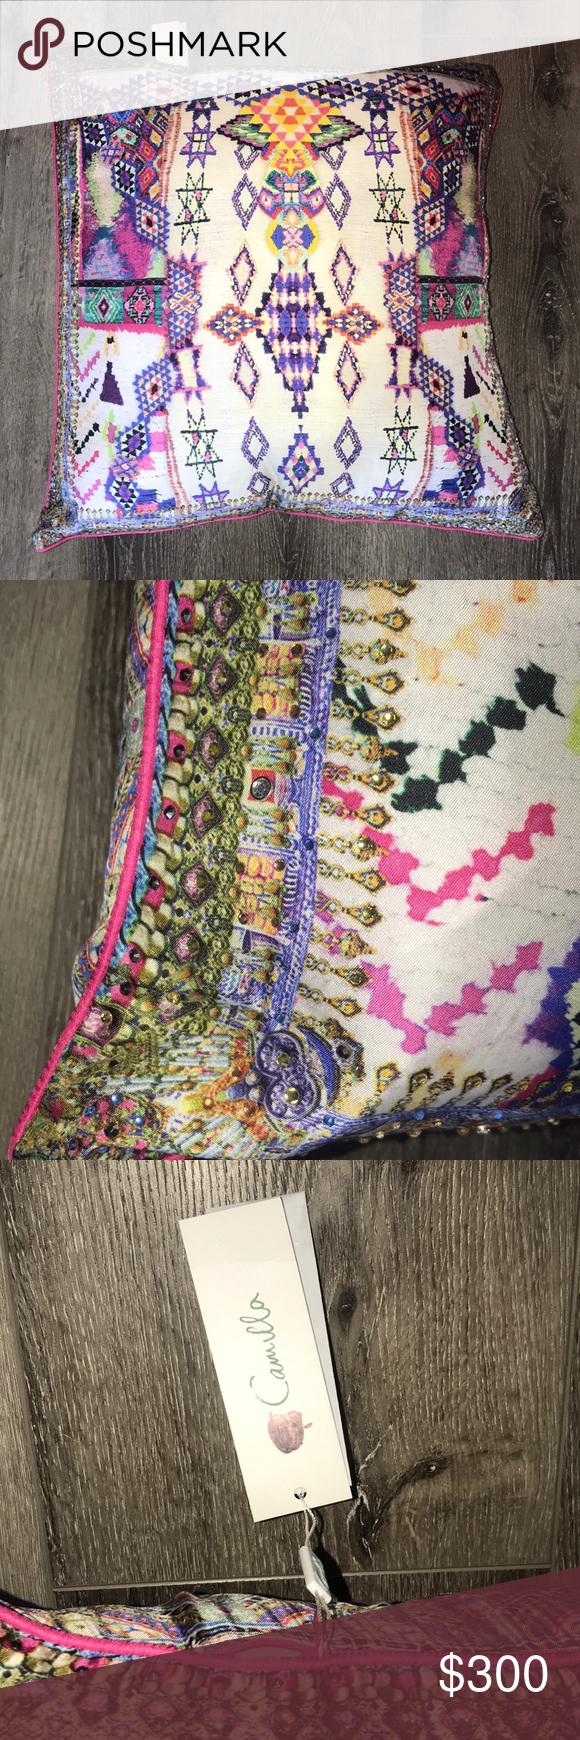 Camilla Mother Knows Best Silk Throw Pillow Silk Throw Pillows Throw Pillows Mother Knows Best